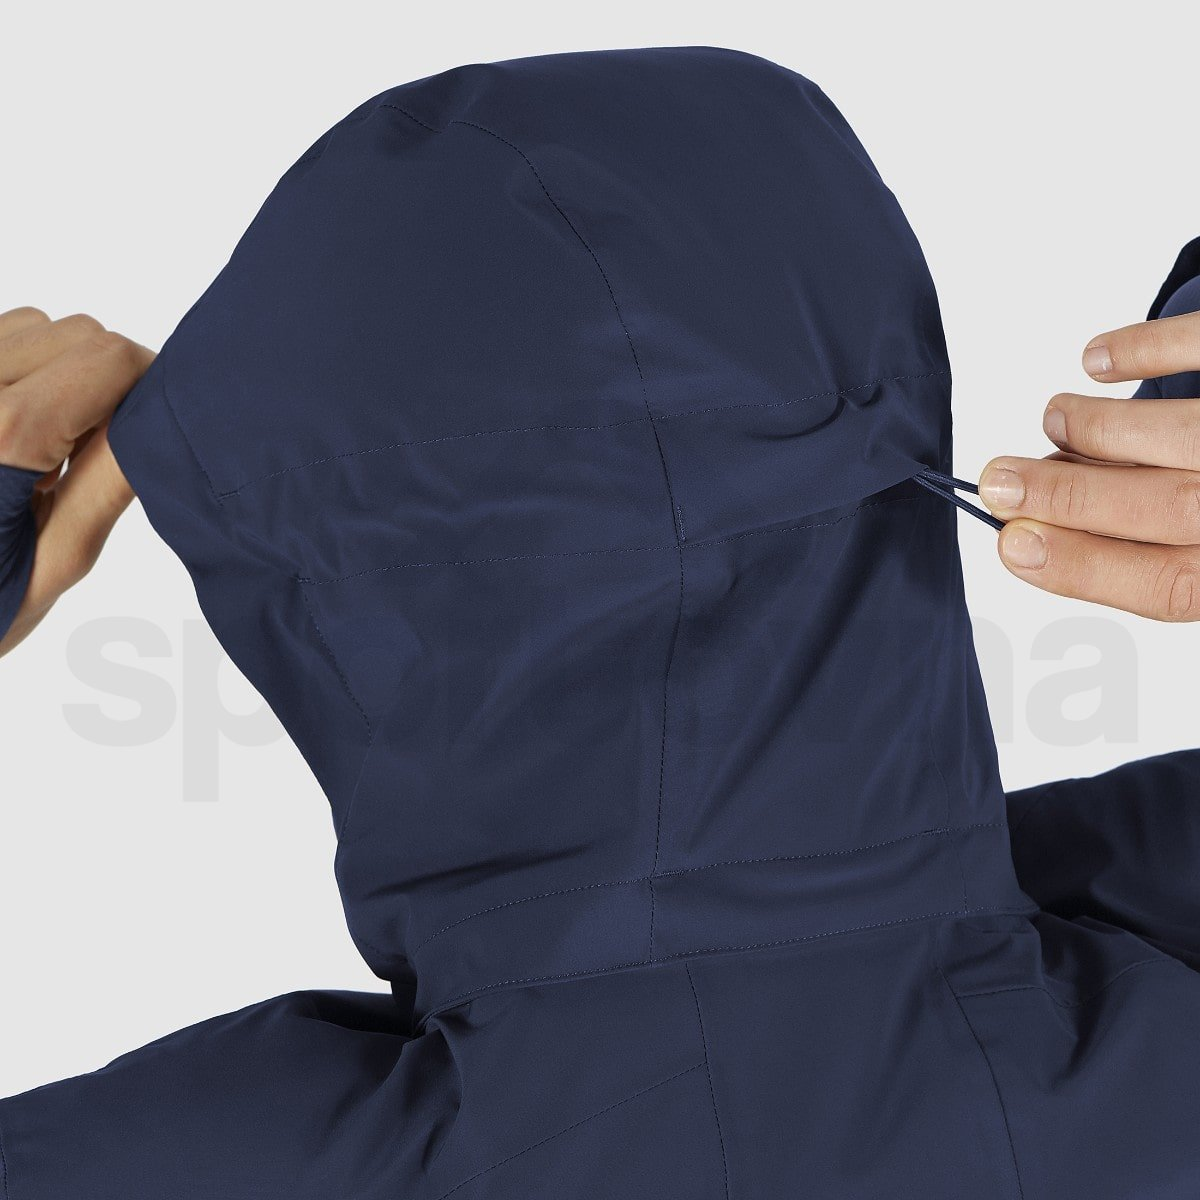 Bunda Salomon Brilliant JKT M - tmavě modrá